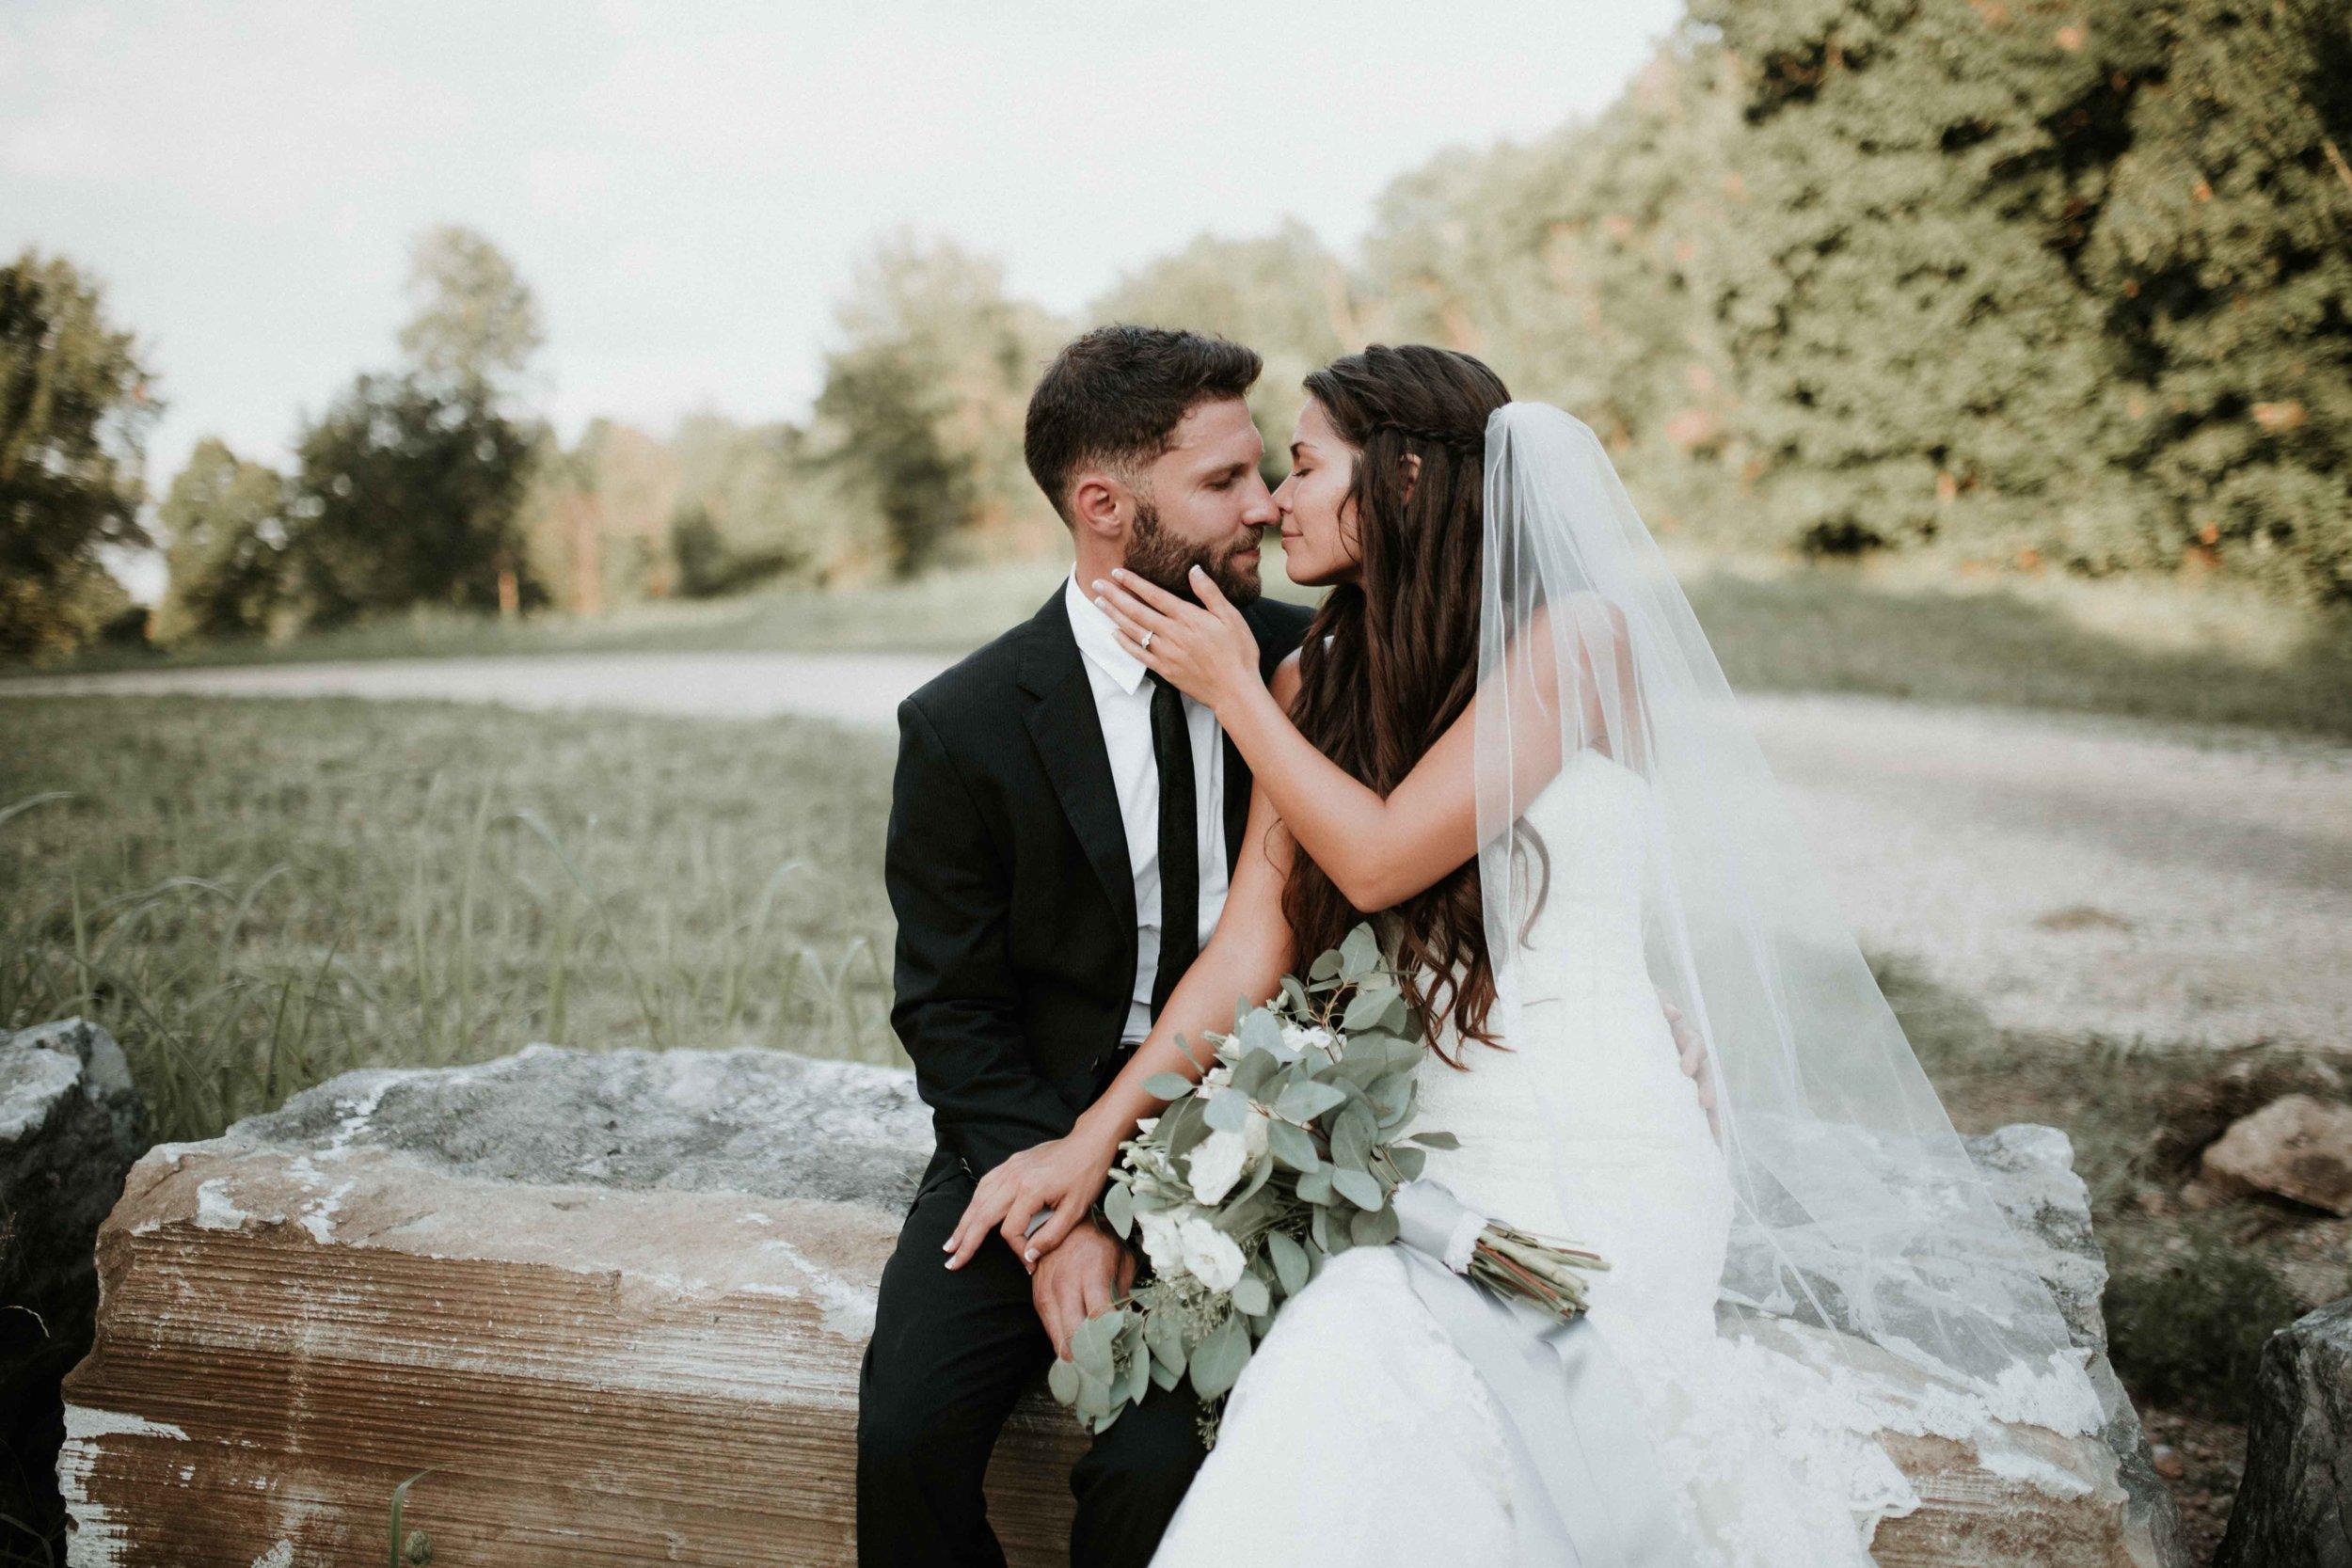 Northwest Arkansas Destination Wedding Photographer-2.jpg